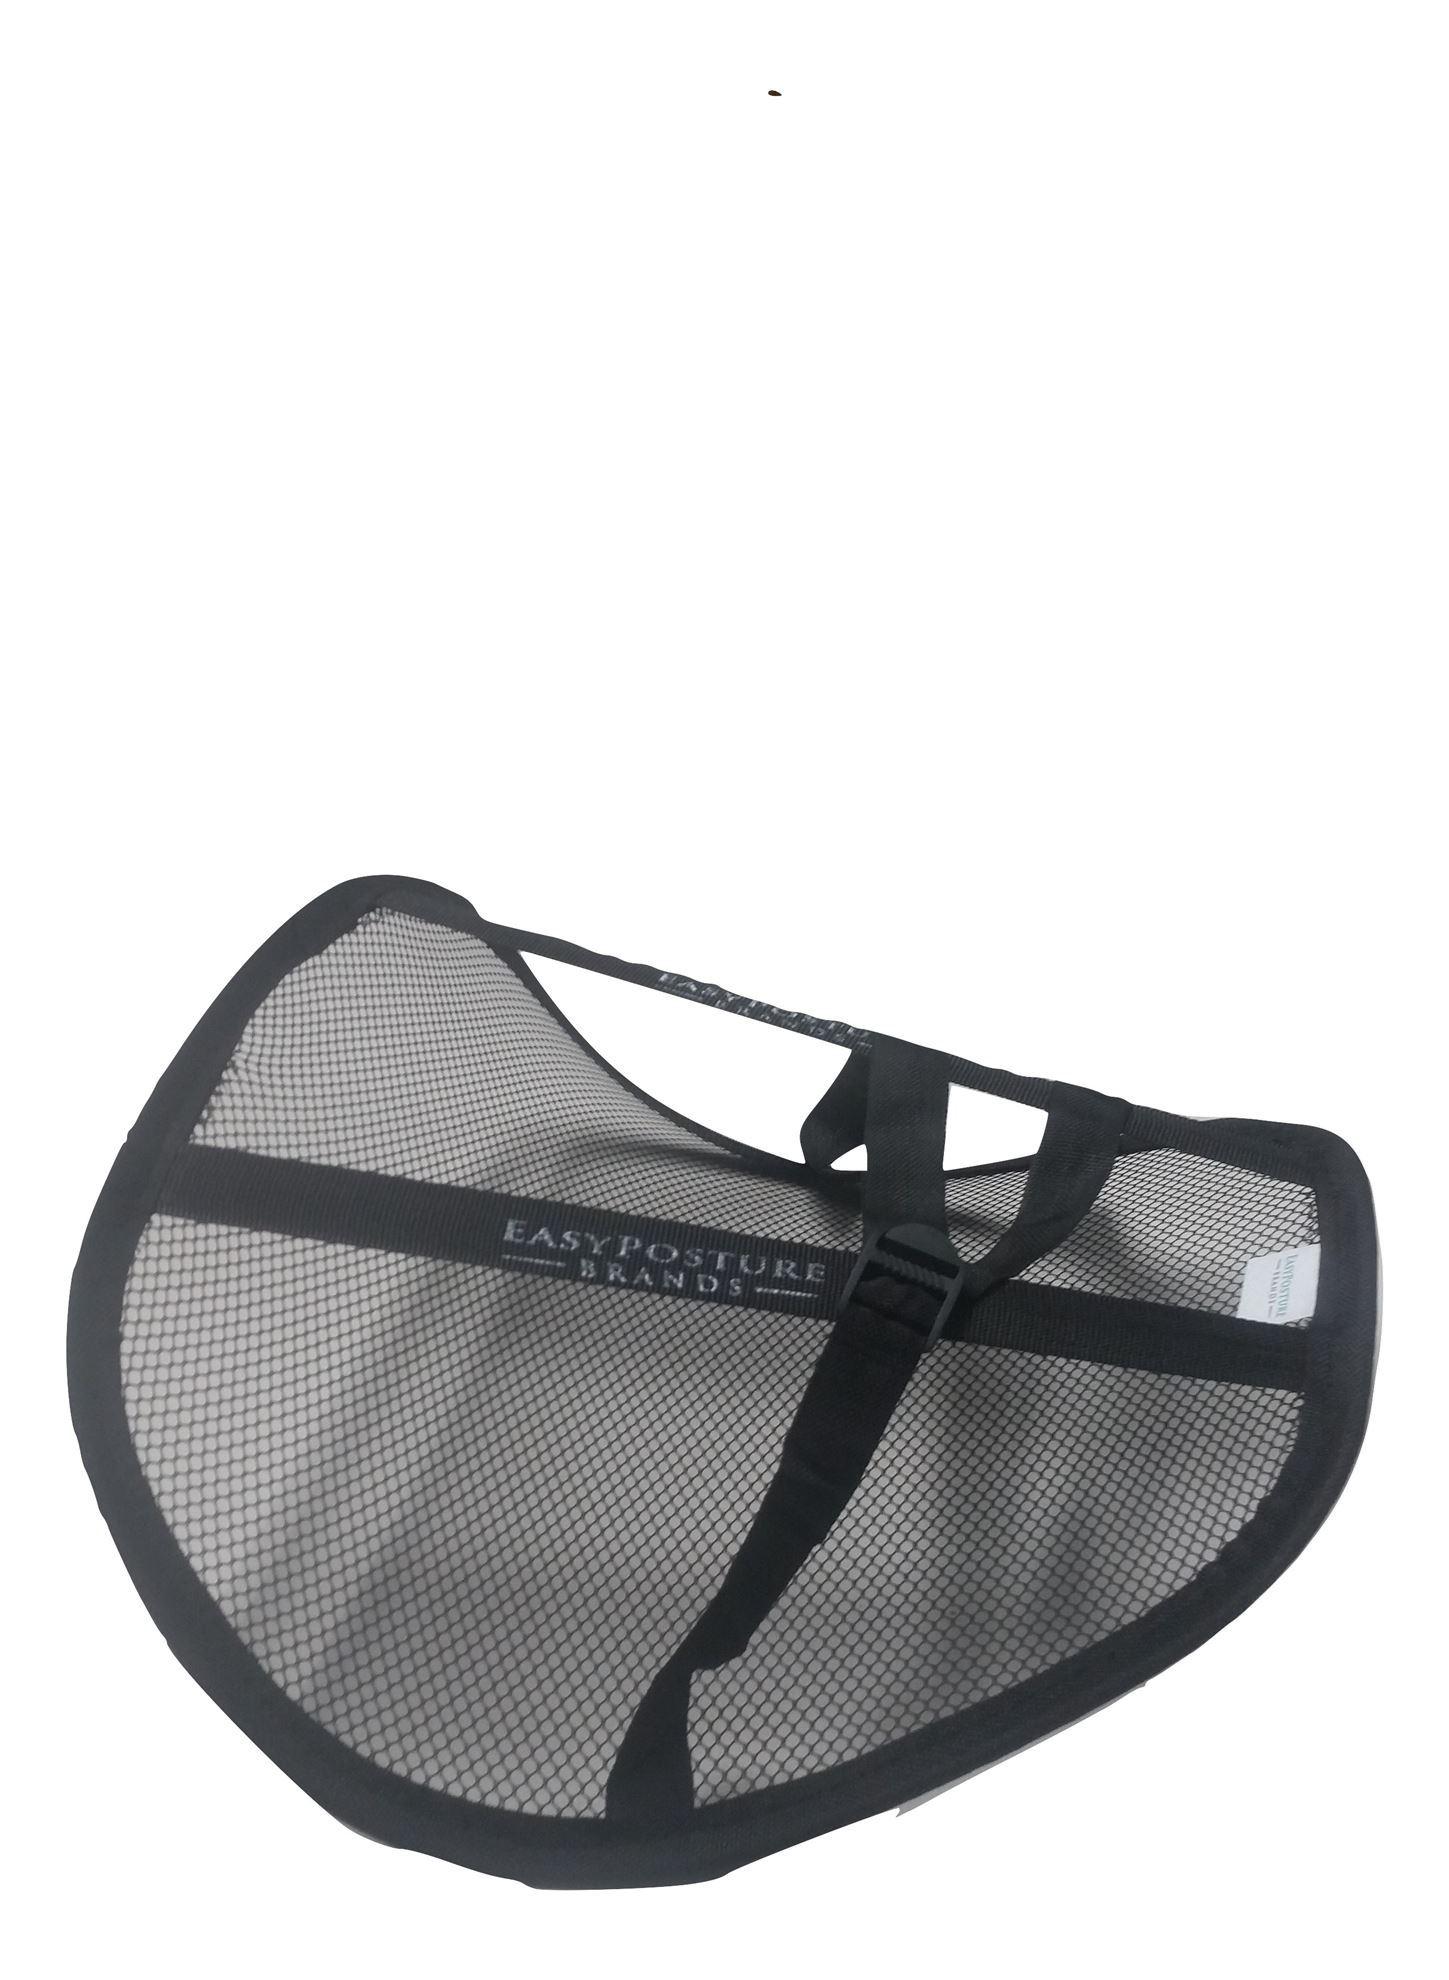 EasyPosture Lumbar Mesh Back Support